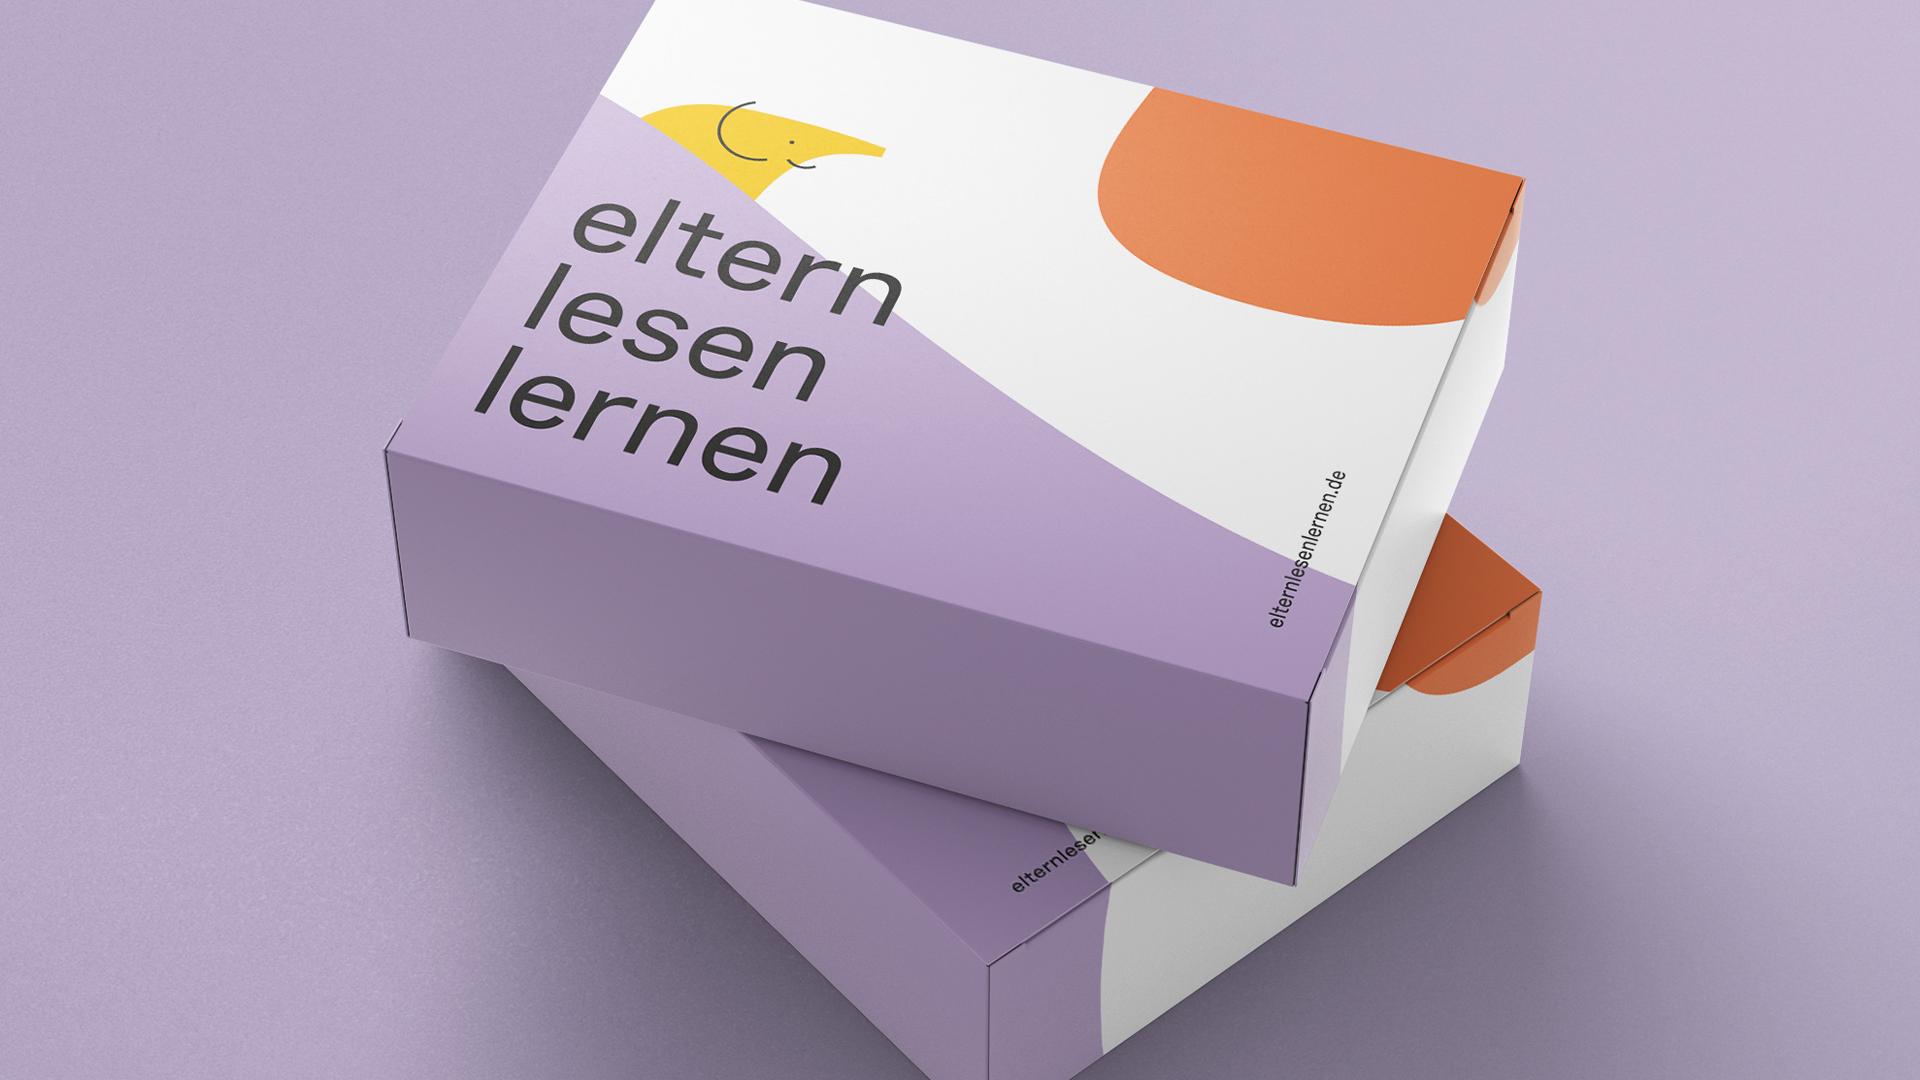 elternlesenlernen_gallery-6